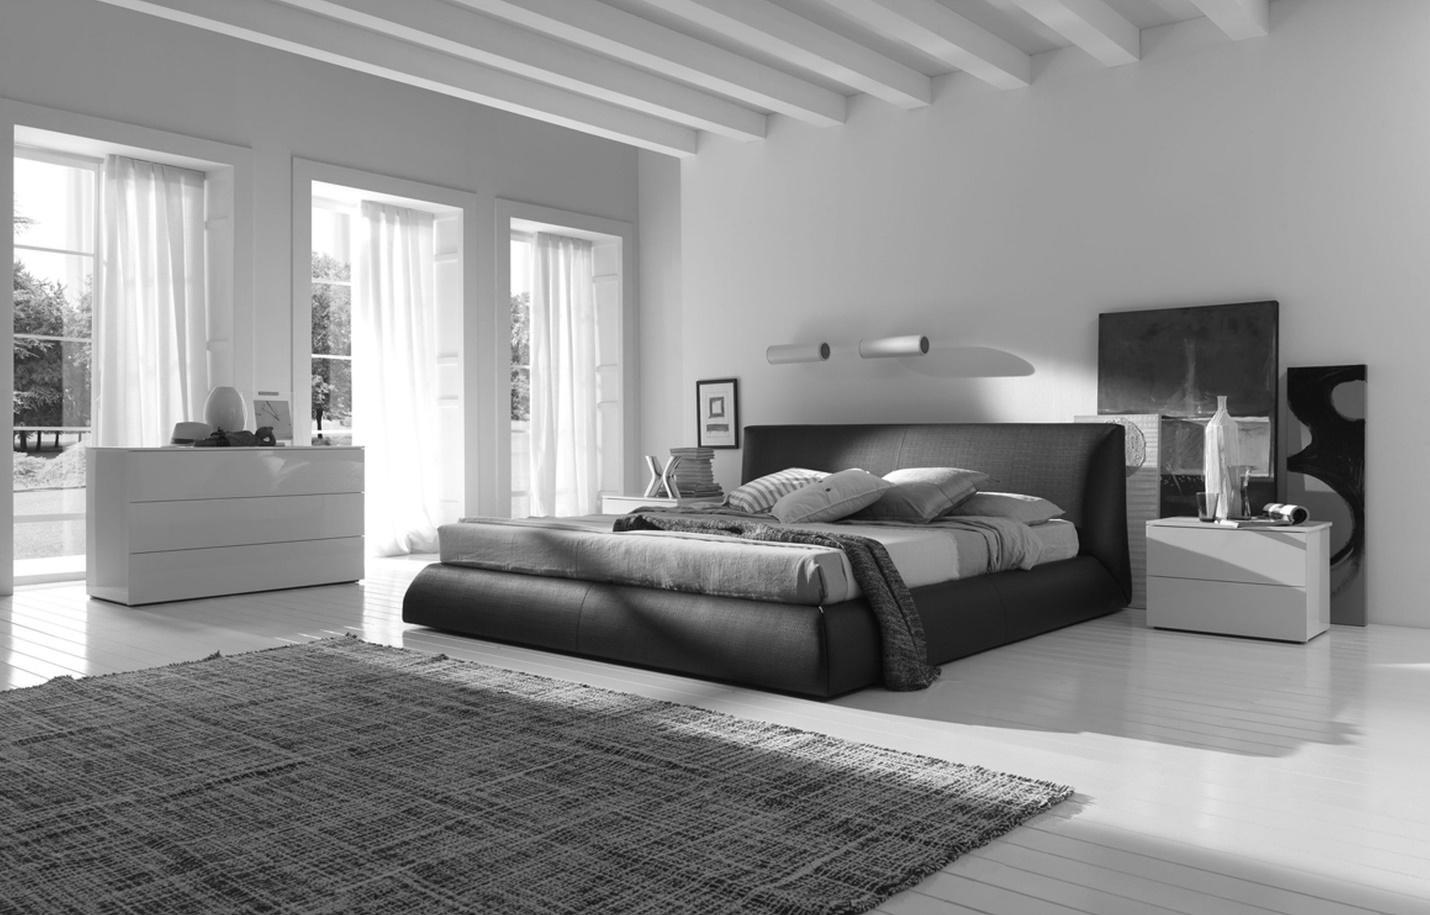 3.SIMPHOME.COM Monochromic Modern Bedroom